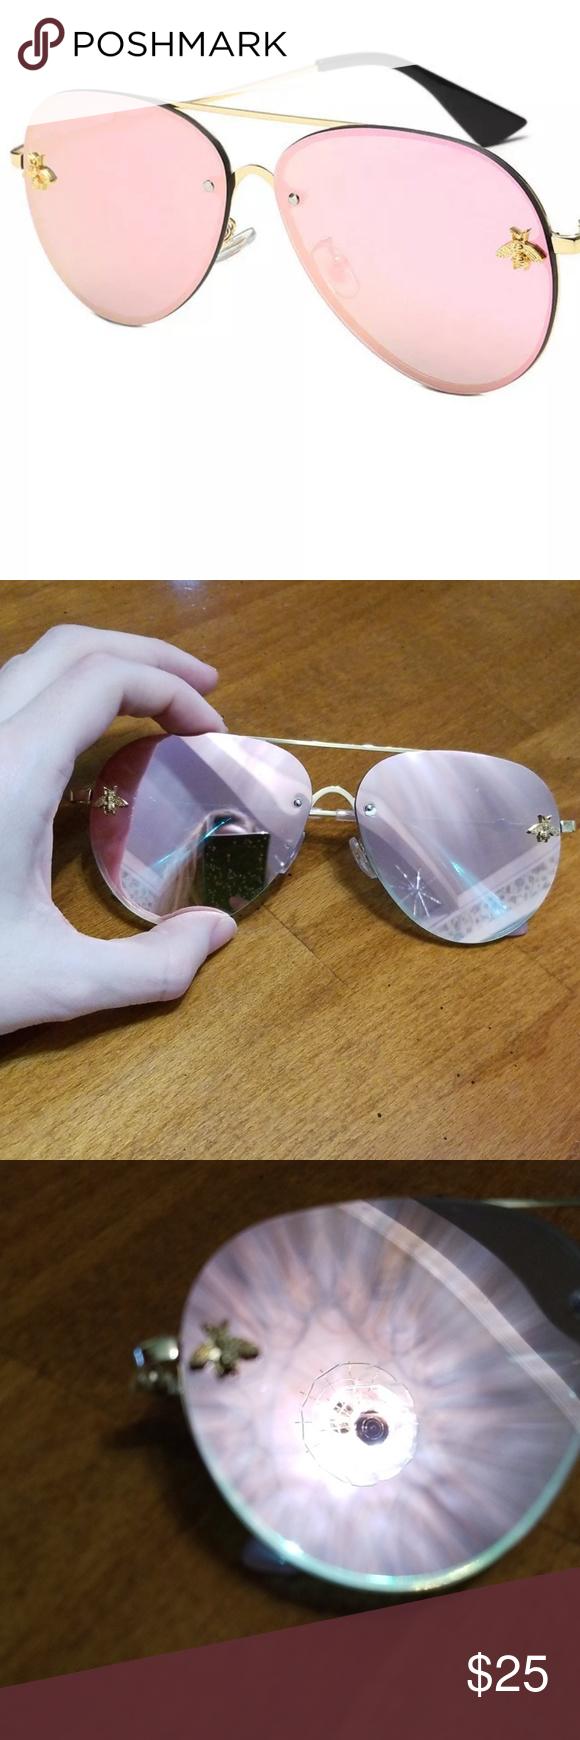 8214316522f14 🐝New  Golden Bee  Sunglasses 🐝 Brand new